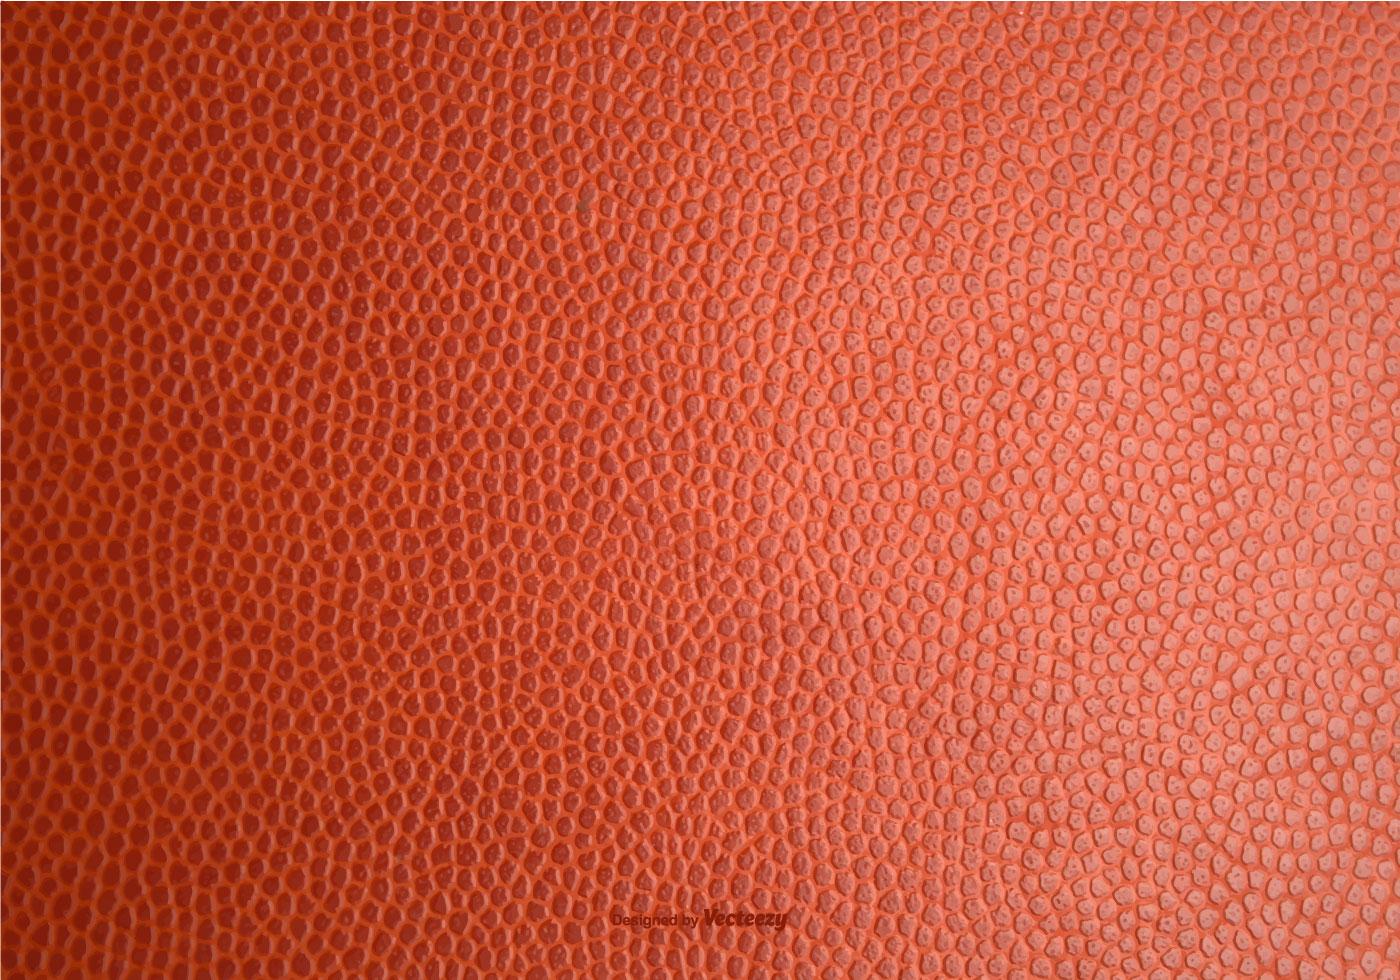 Basketball Hoop Wallpaper